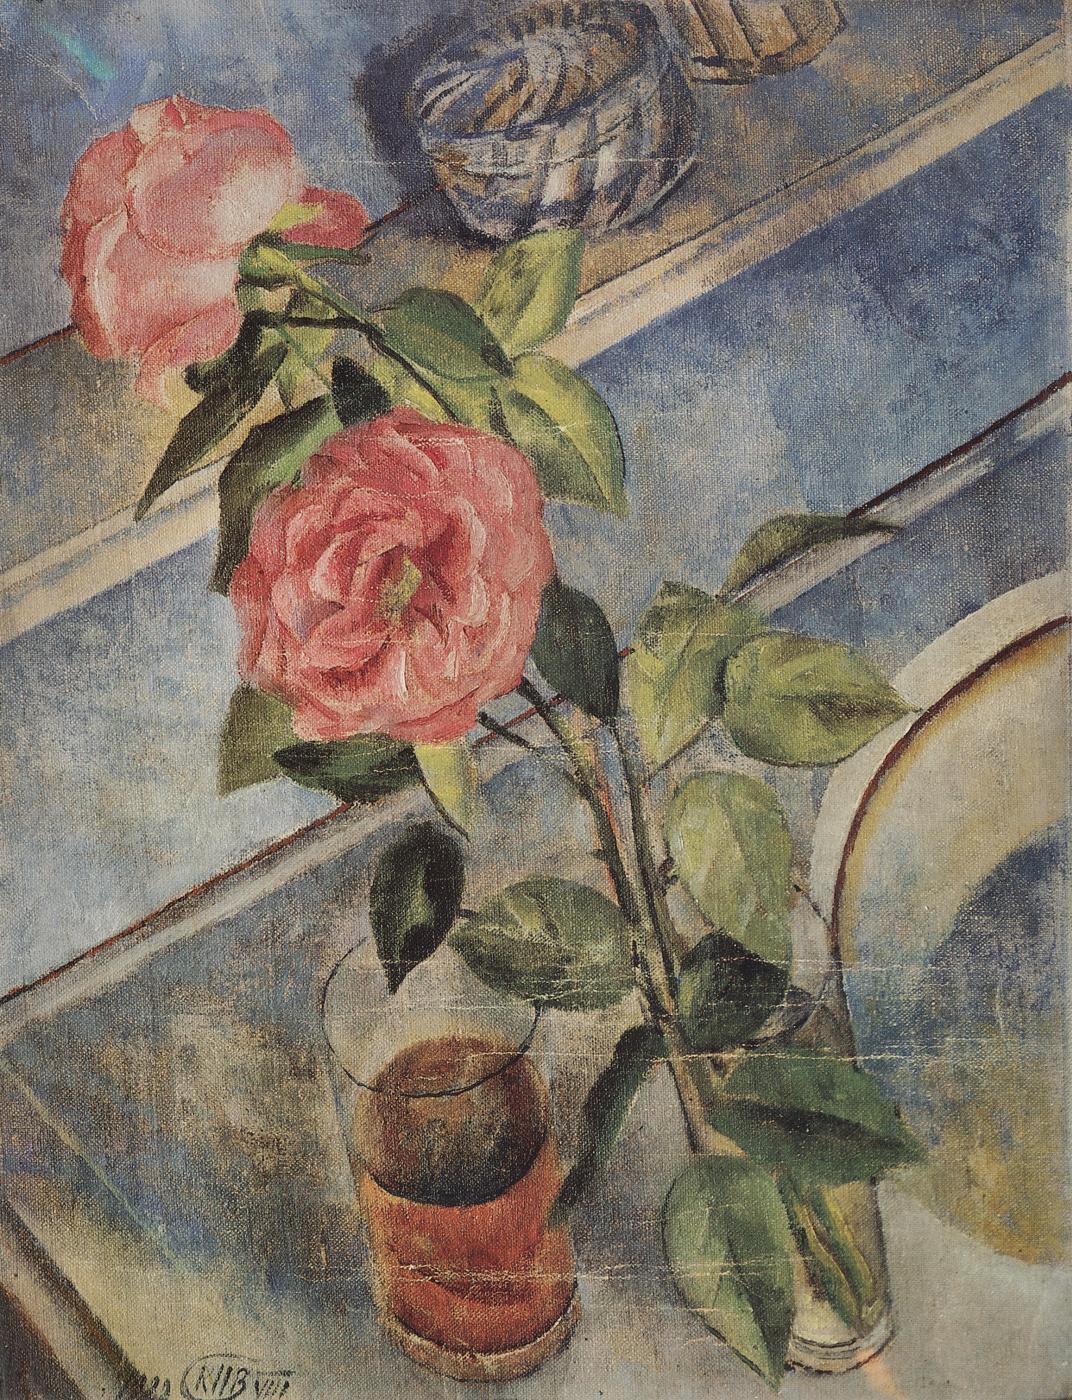 Kuzma Sergeevich Petrov-Vodkin. Still life with roses